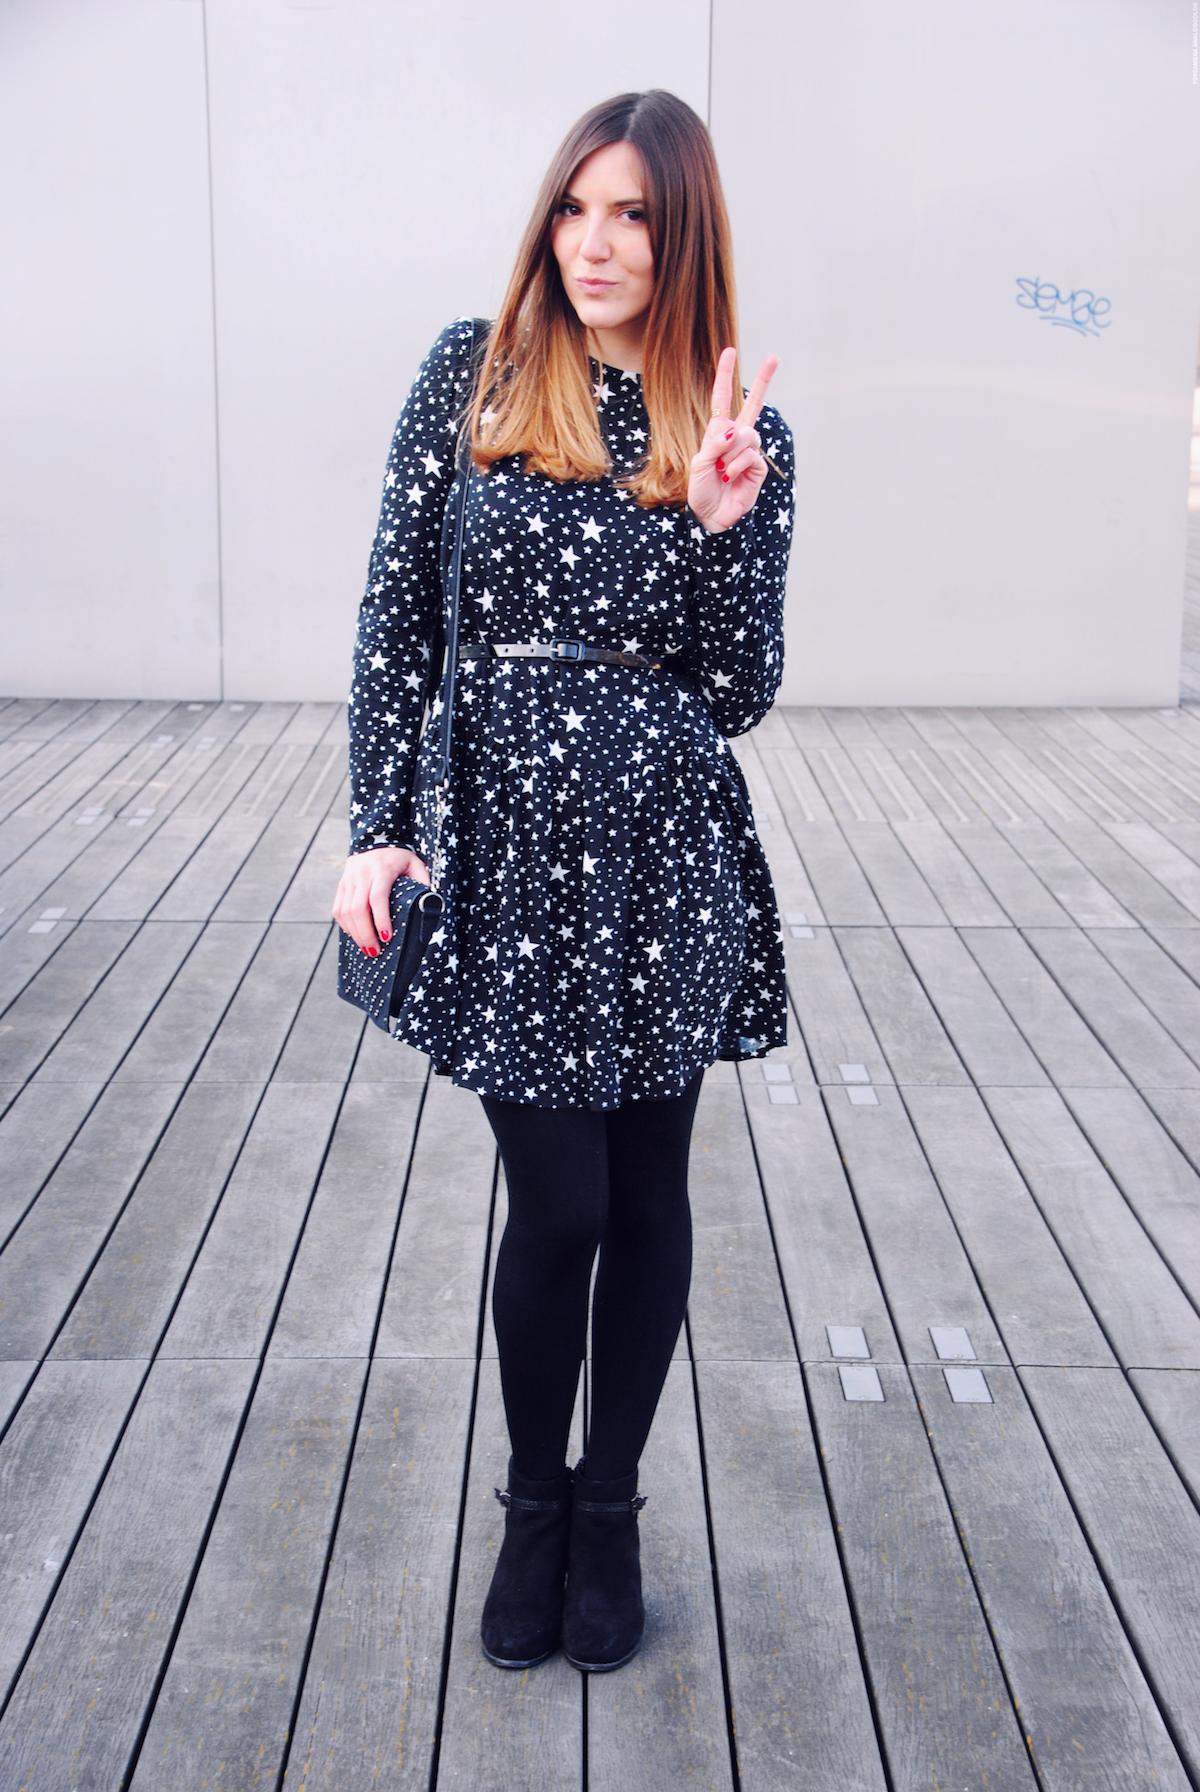 stars printed dress